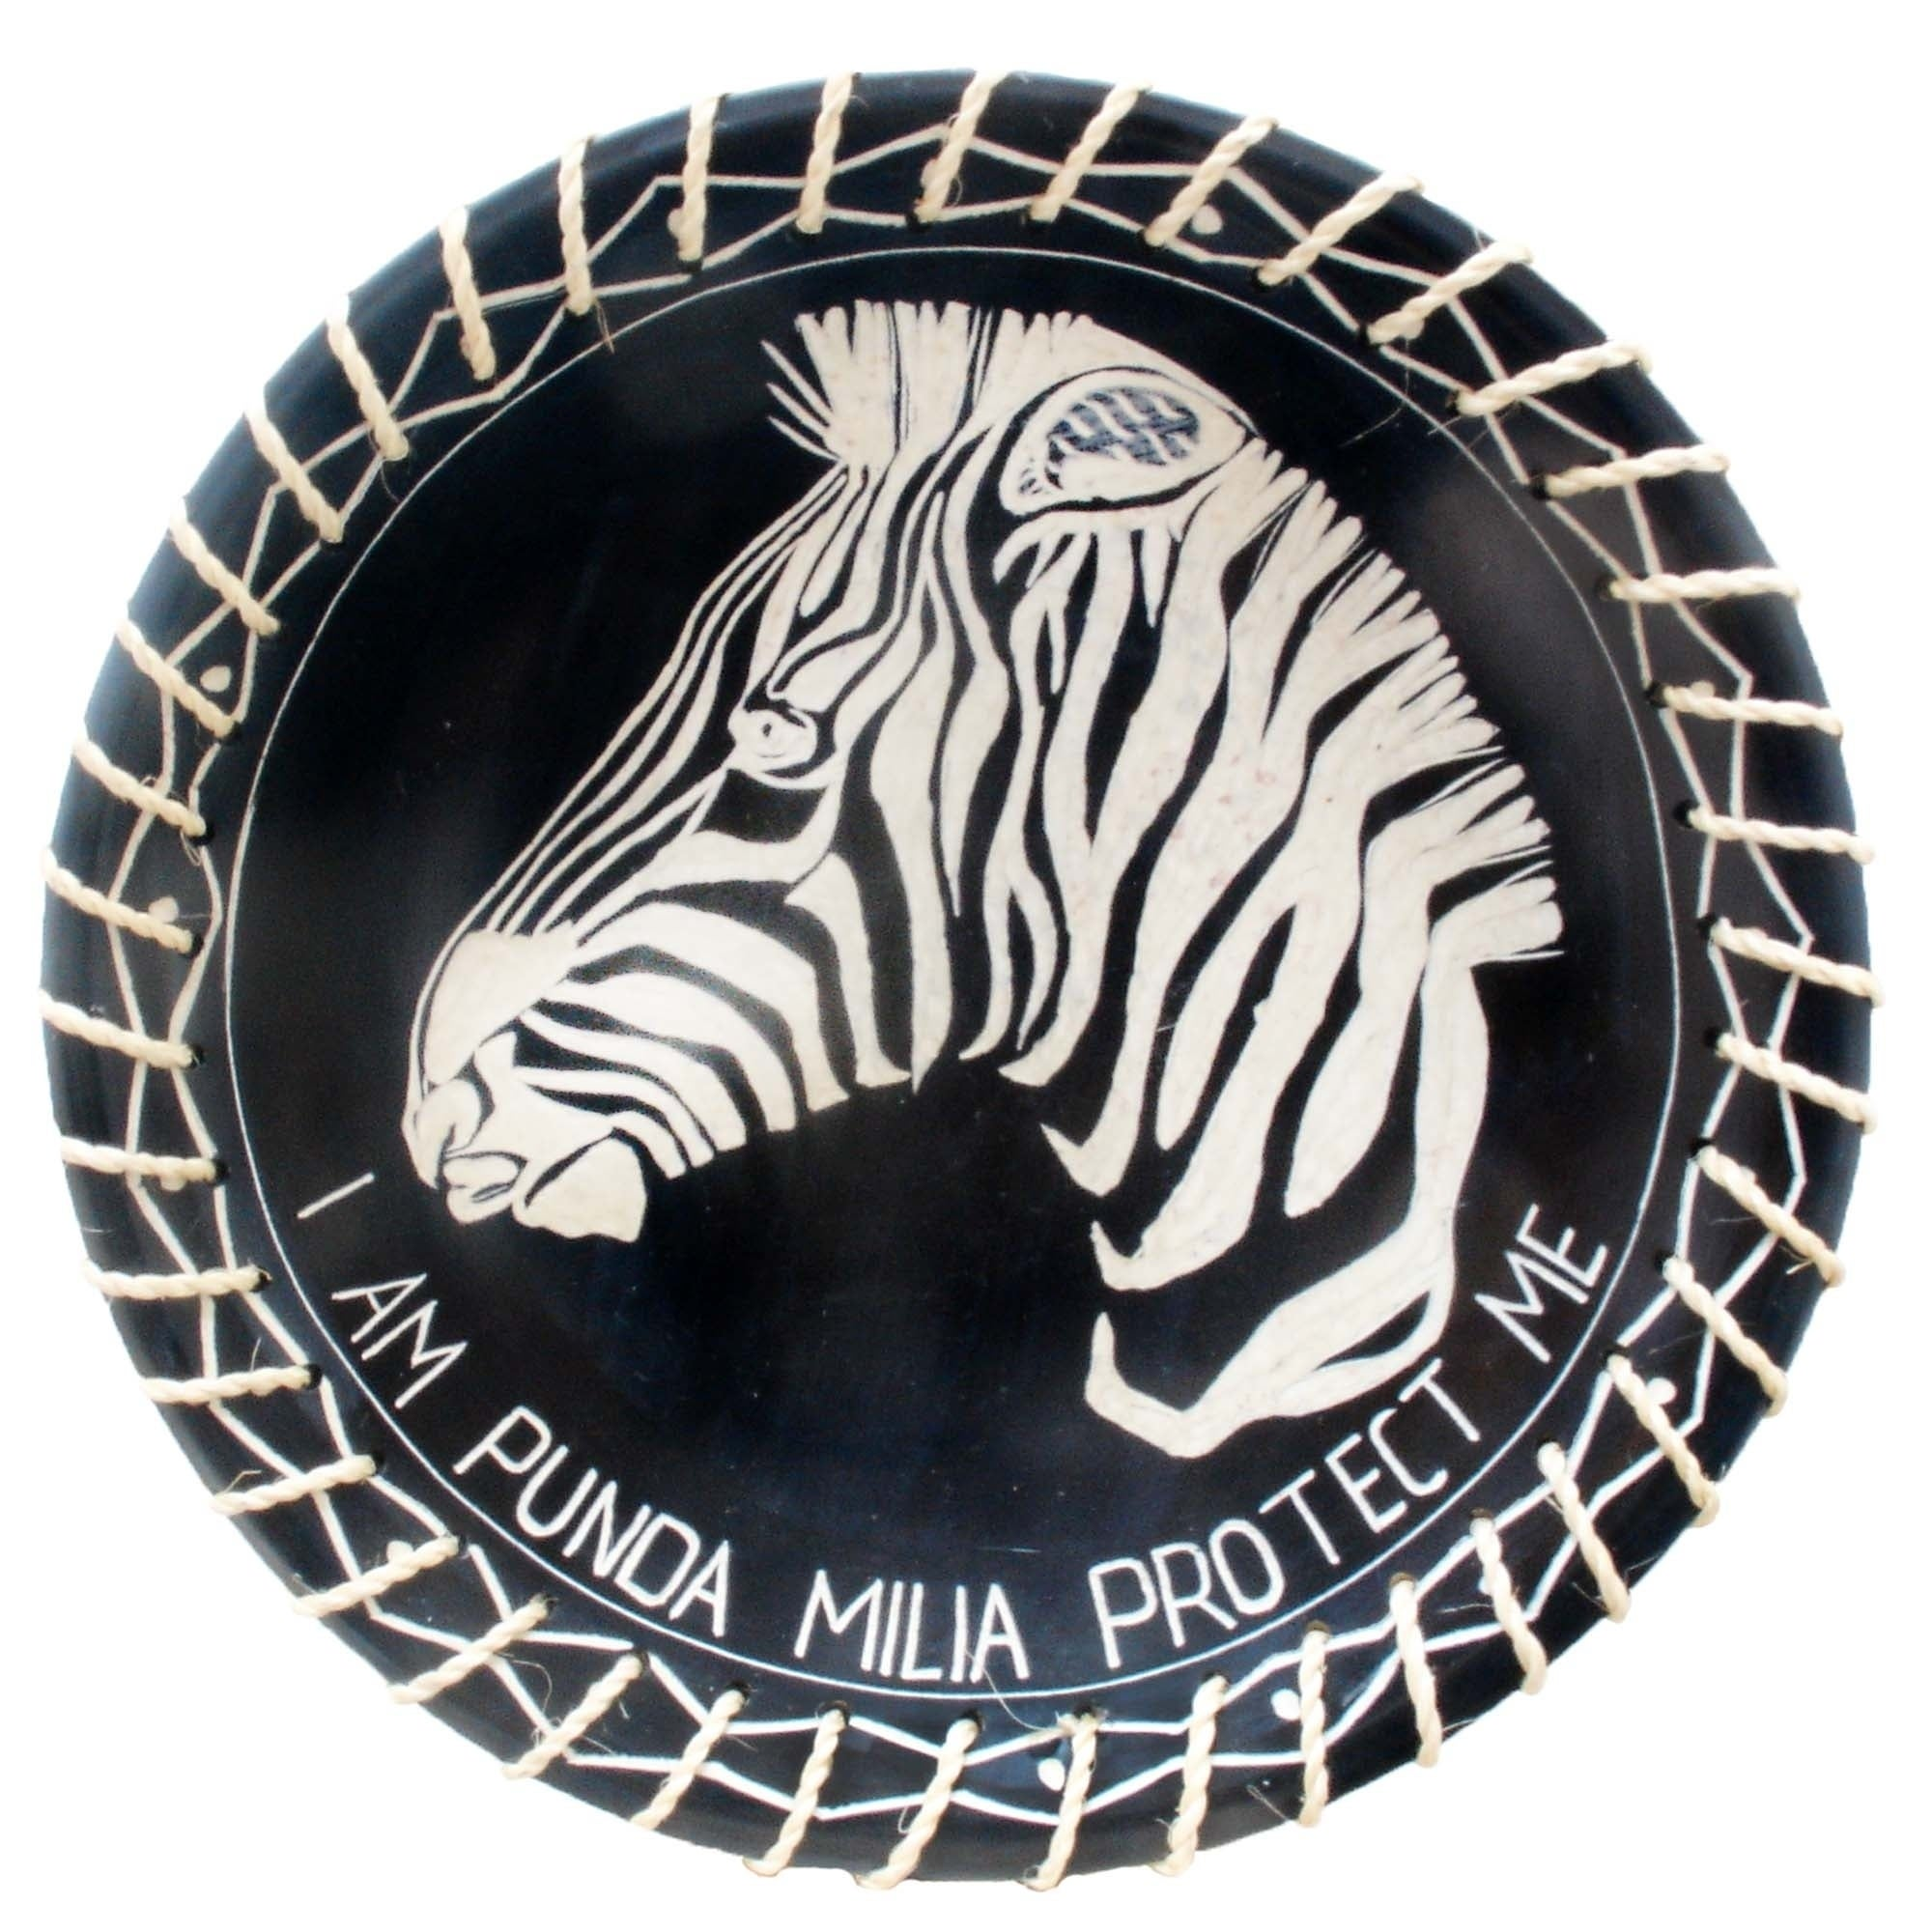 Handmade 8 Protect Me Kisii Soapstone Zebra Plate With Sisal Rope Kenya Overstock 27649484